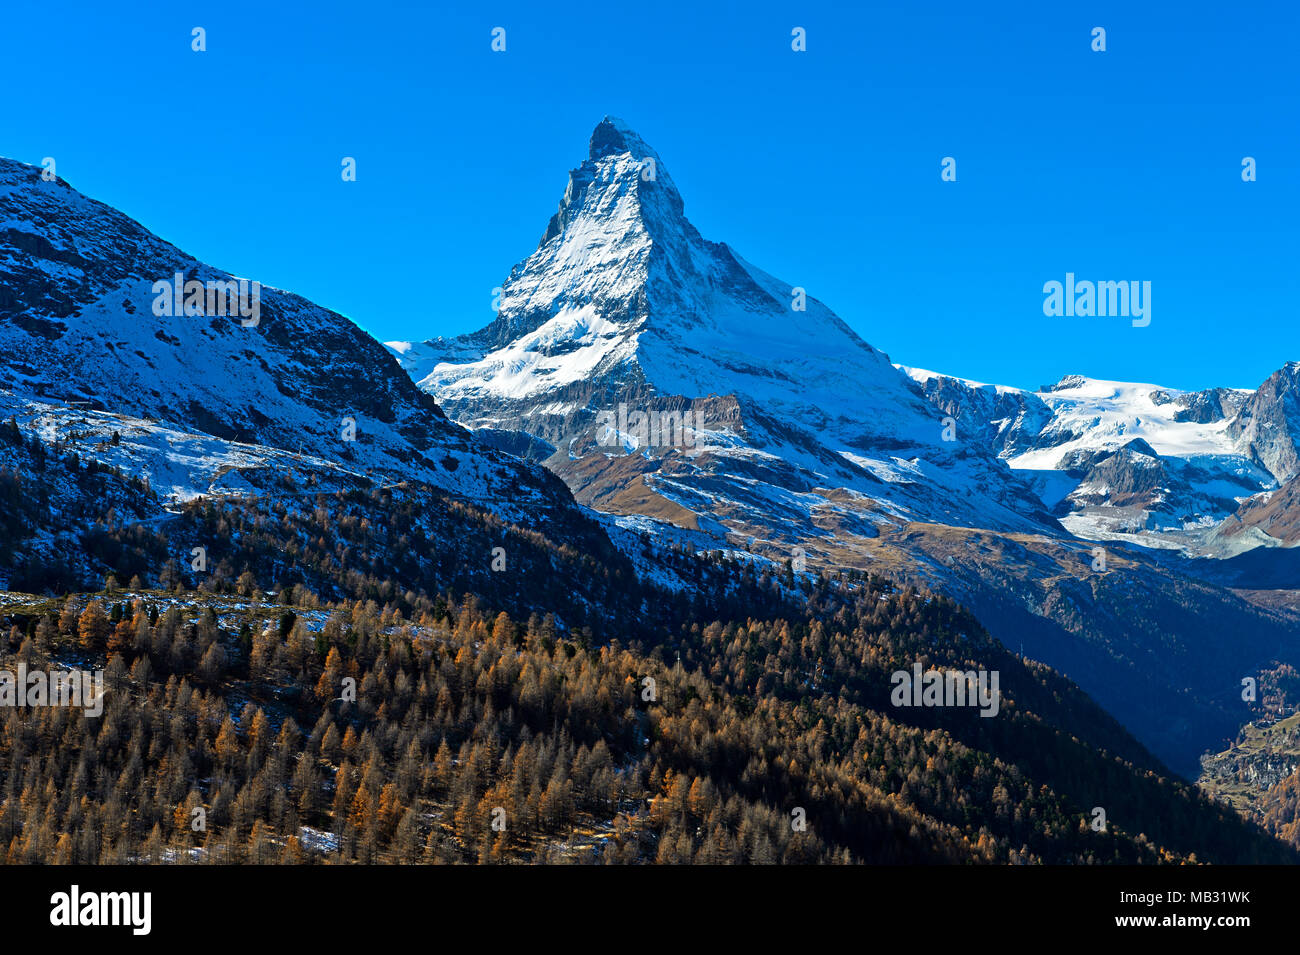 Matterhorn with Hörnligrat, Zermatt, Valais, Switzerland - Stock Image